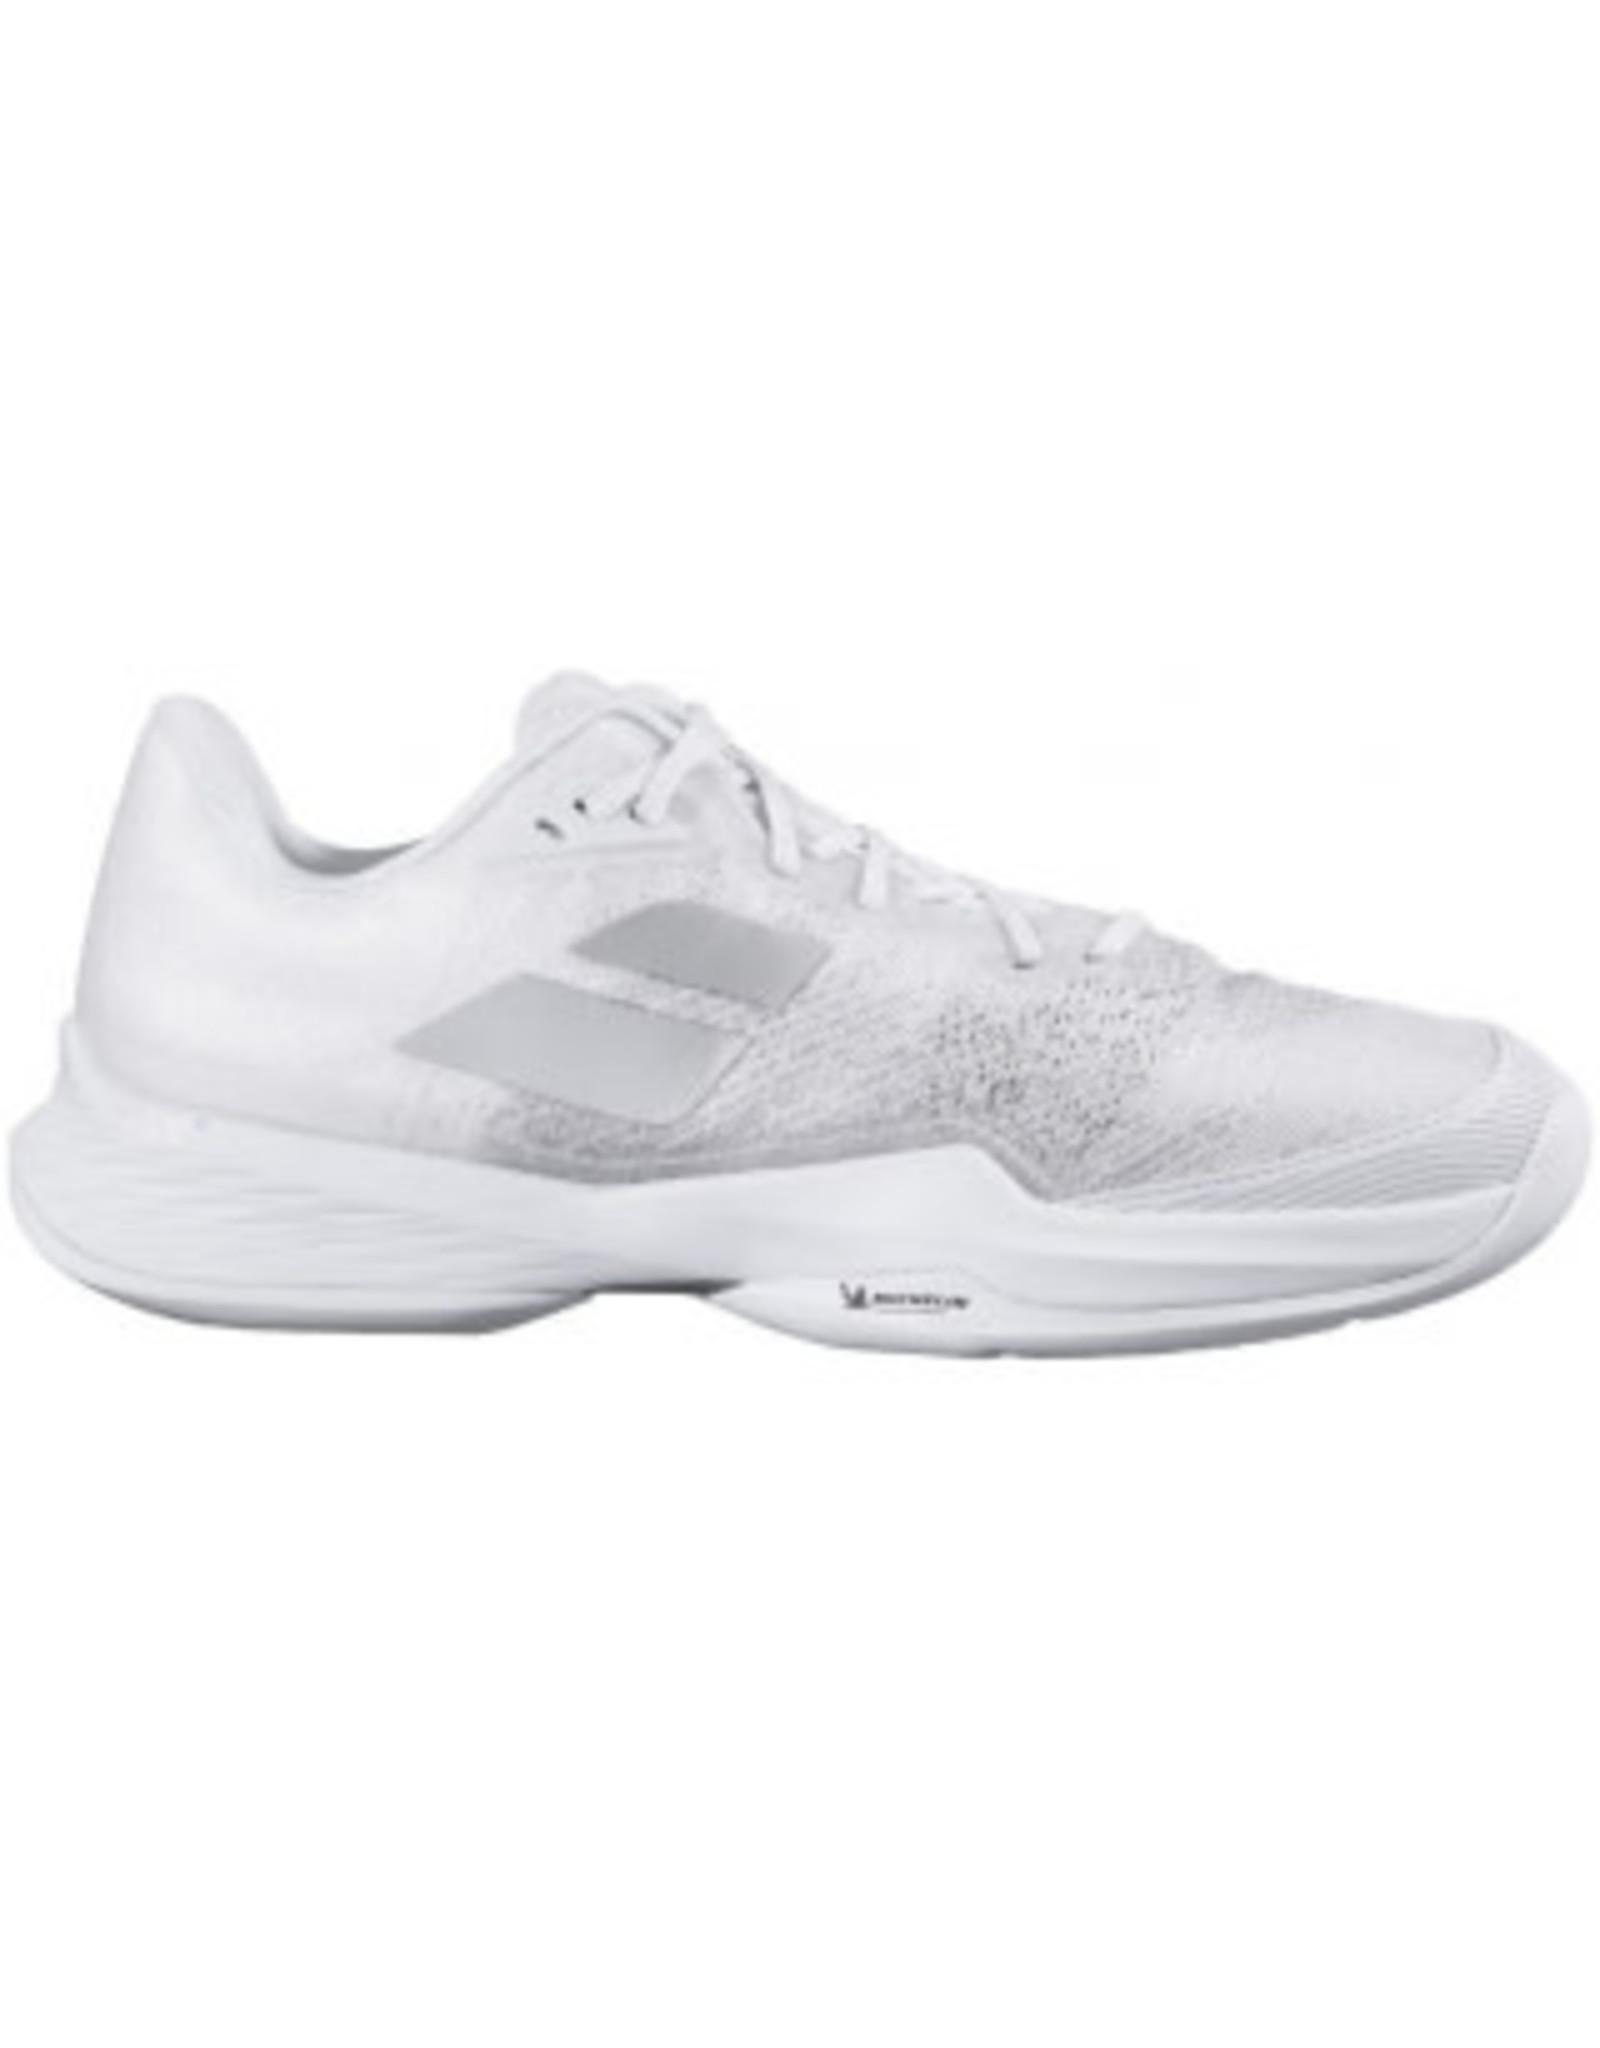 Babolat Babolat Jet Mach 3 AC Men's Tennis Shoes (White/Silver)